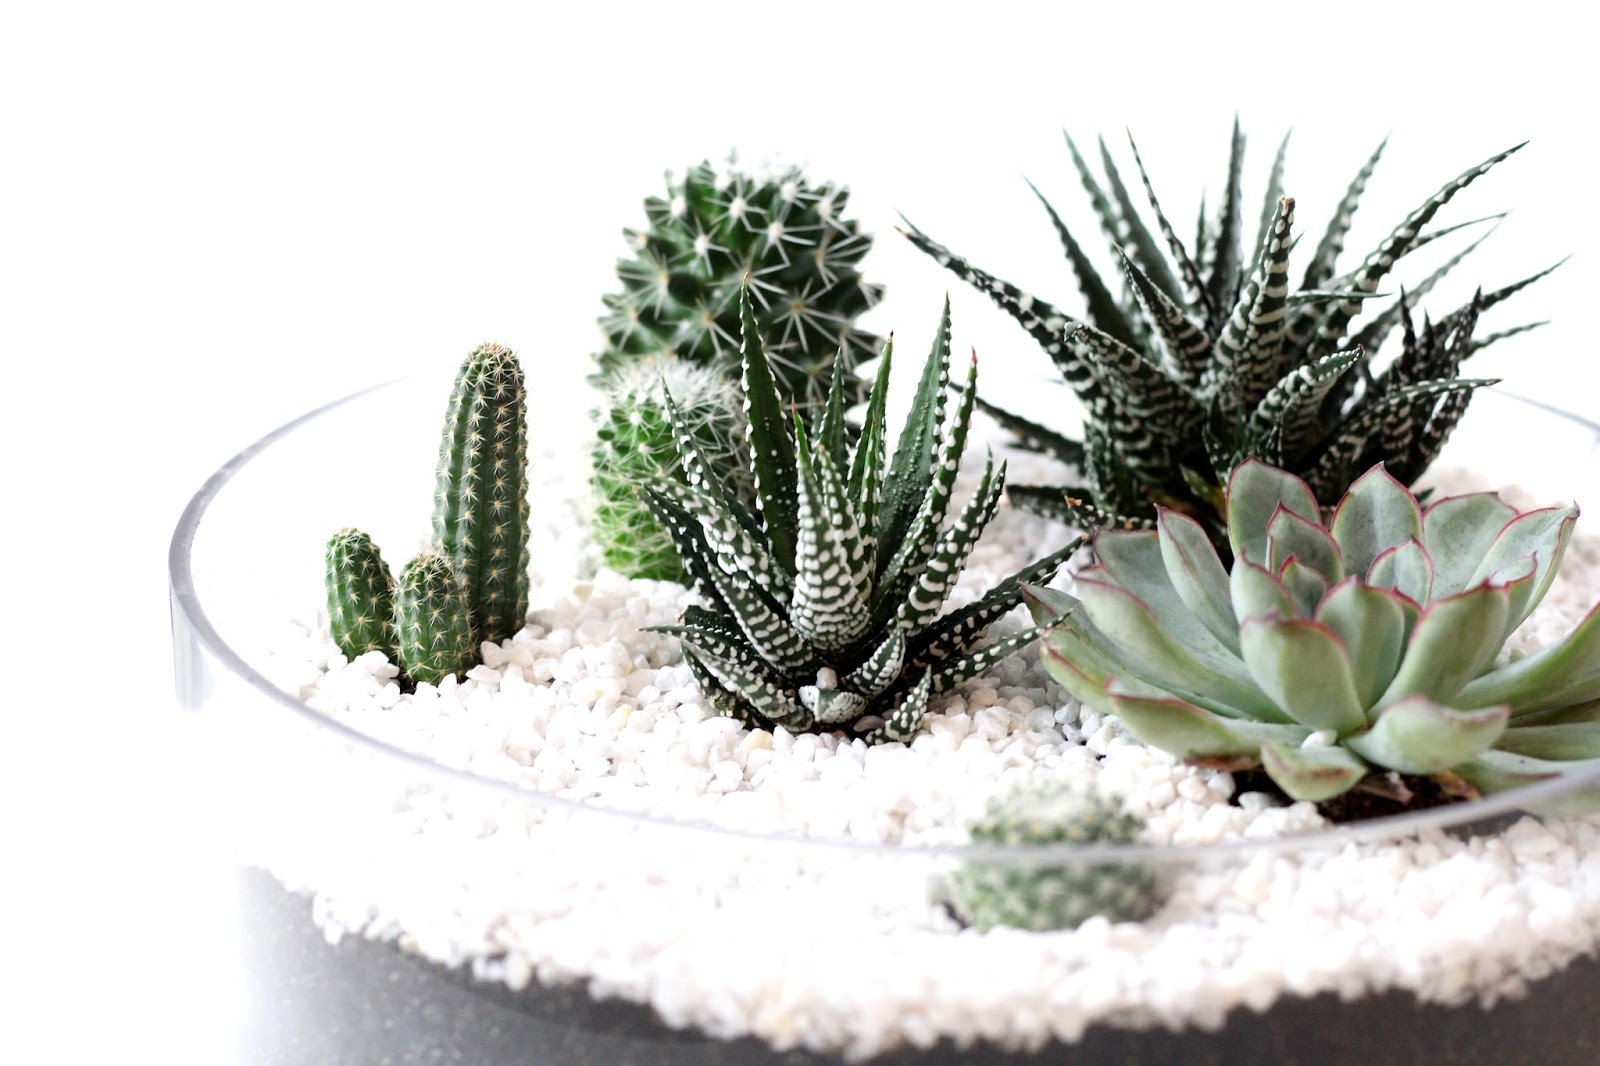 vergissmeinnicht mini succulent garden interior diy. Black Bedroom Furniture Sets. Home Design Ideas